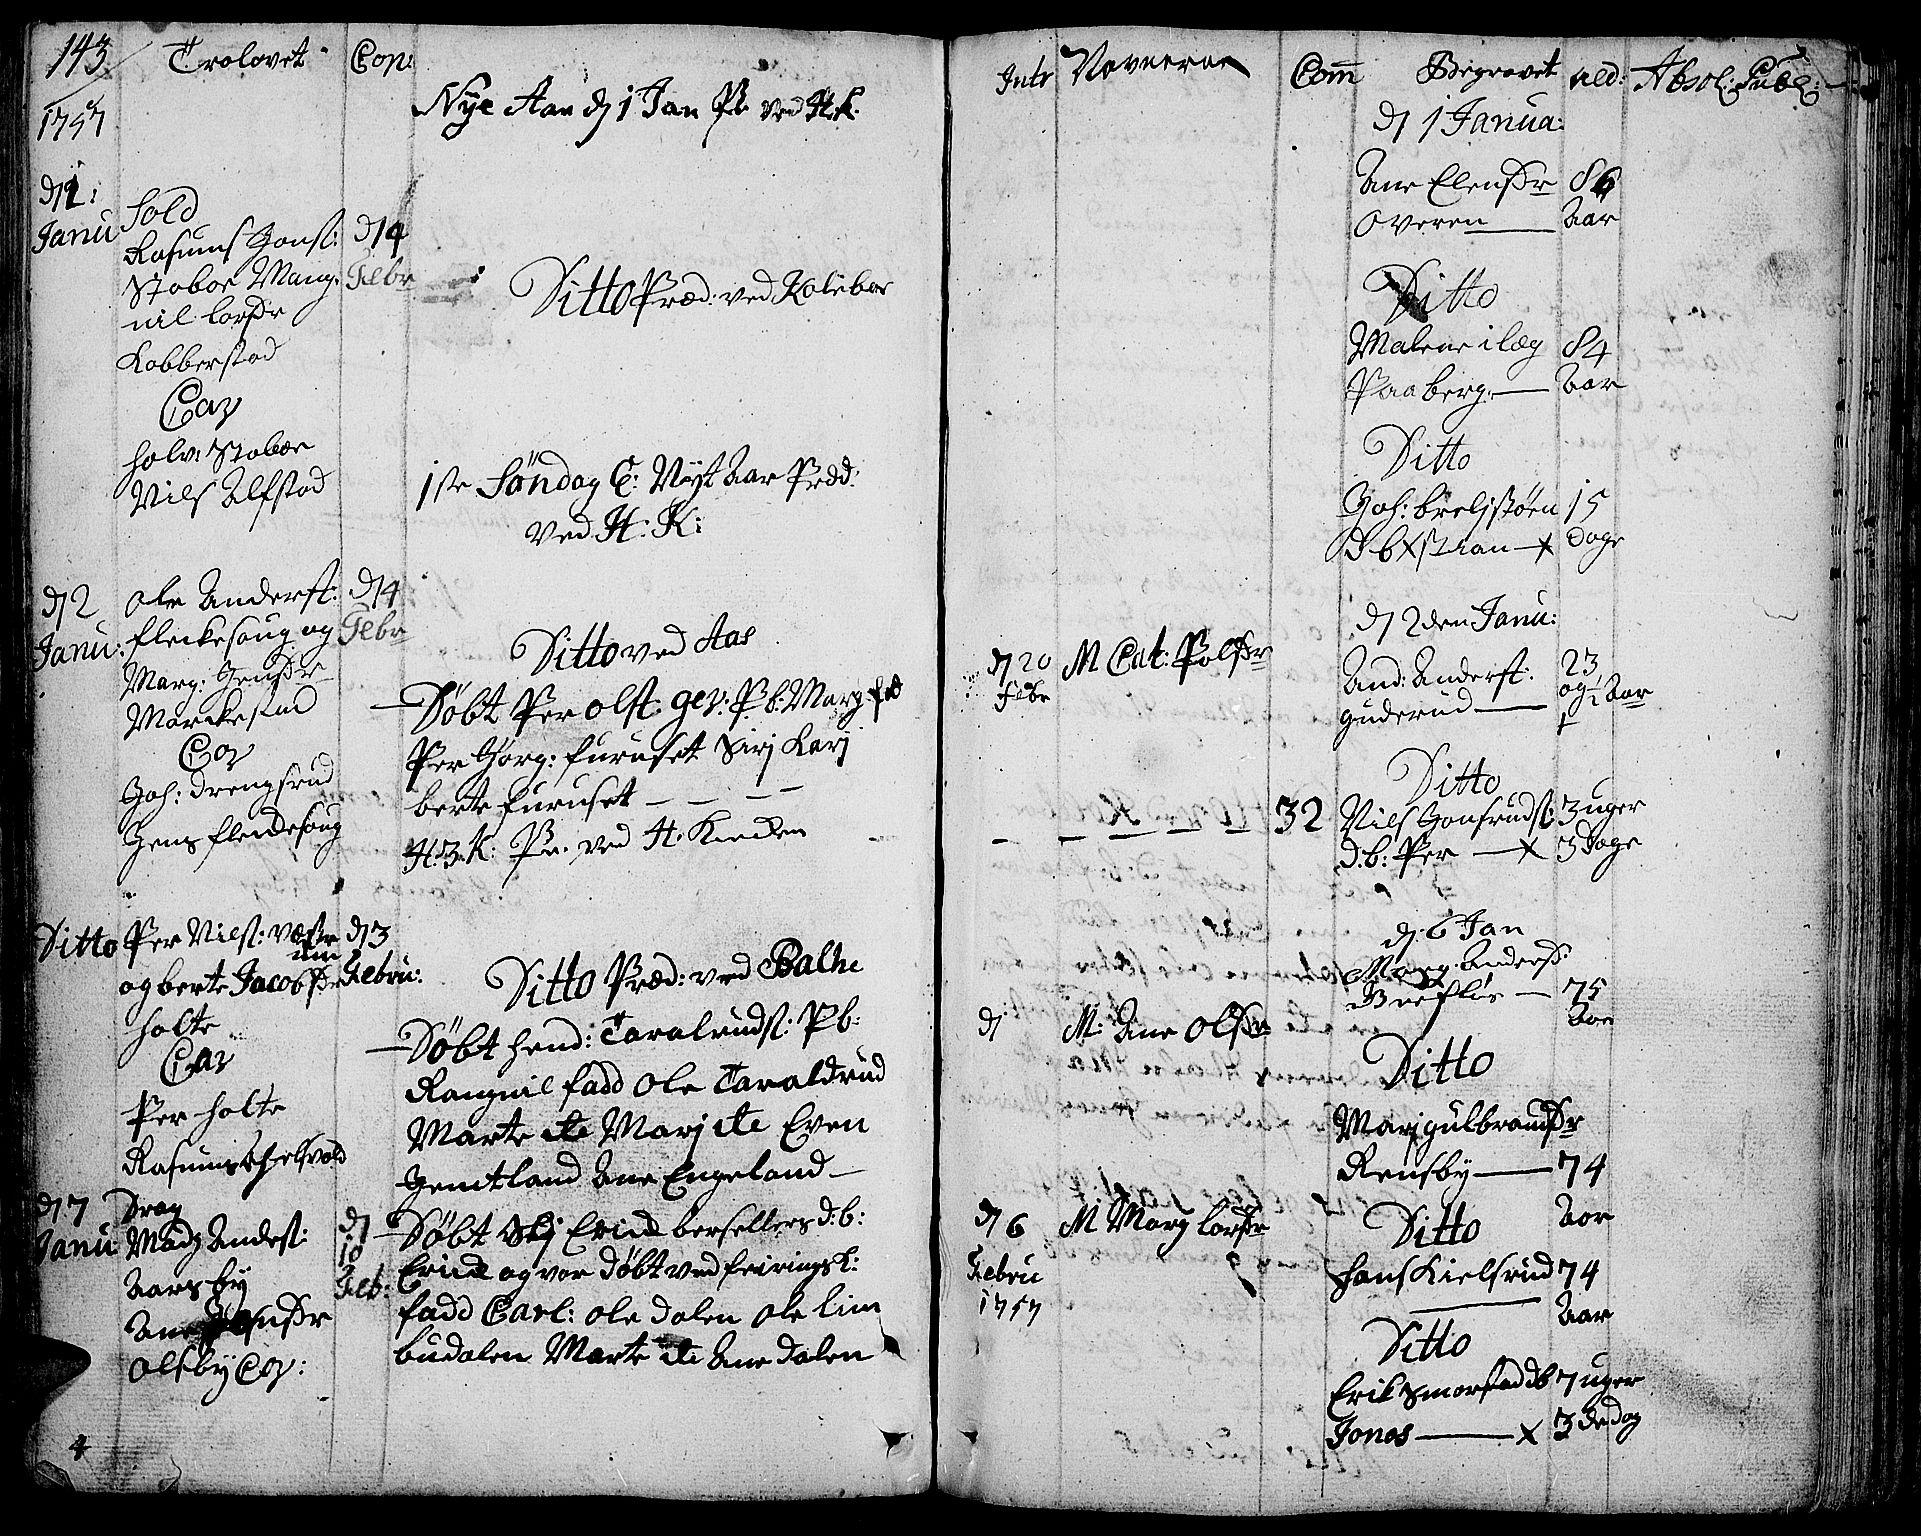 SAH, Toten prestekontor, Ministerialbok nr. 4, 1751-1761, s. 143